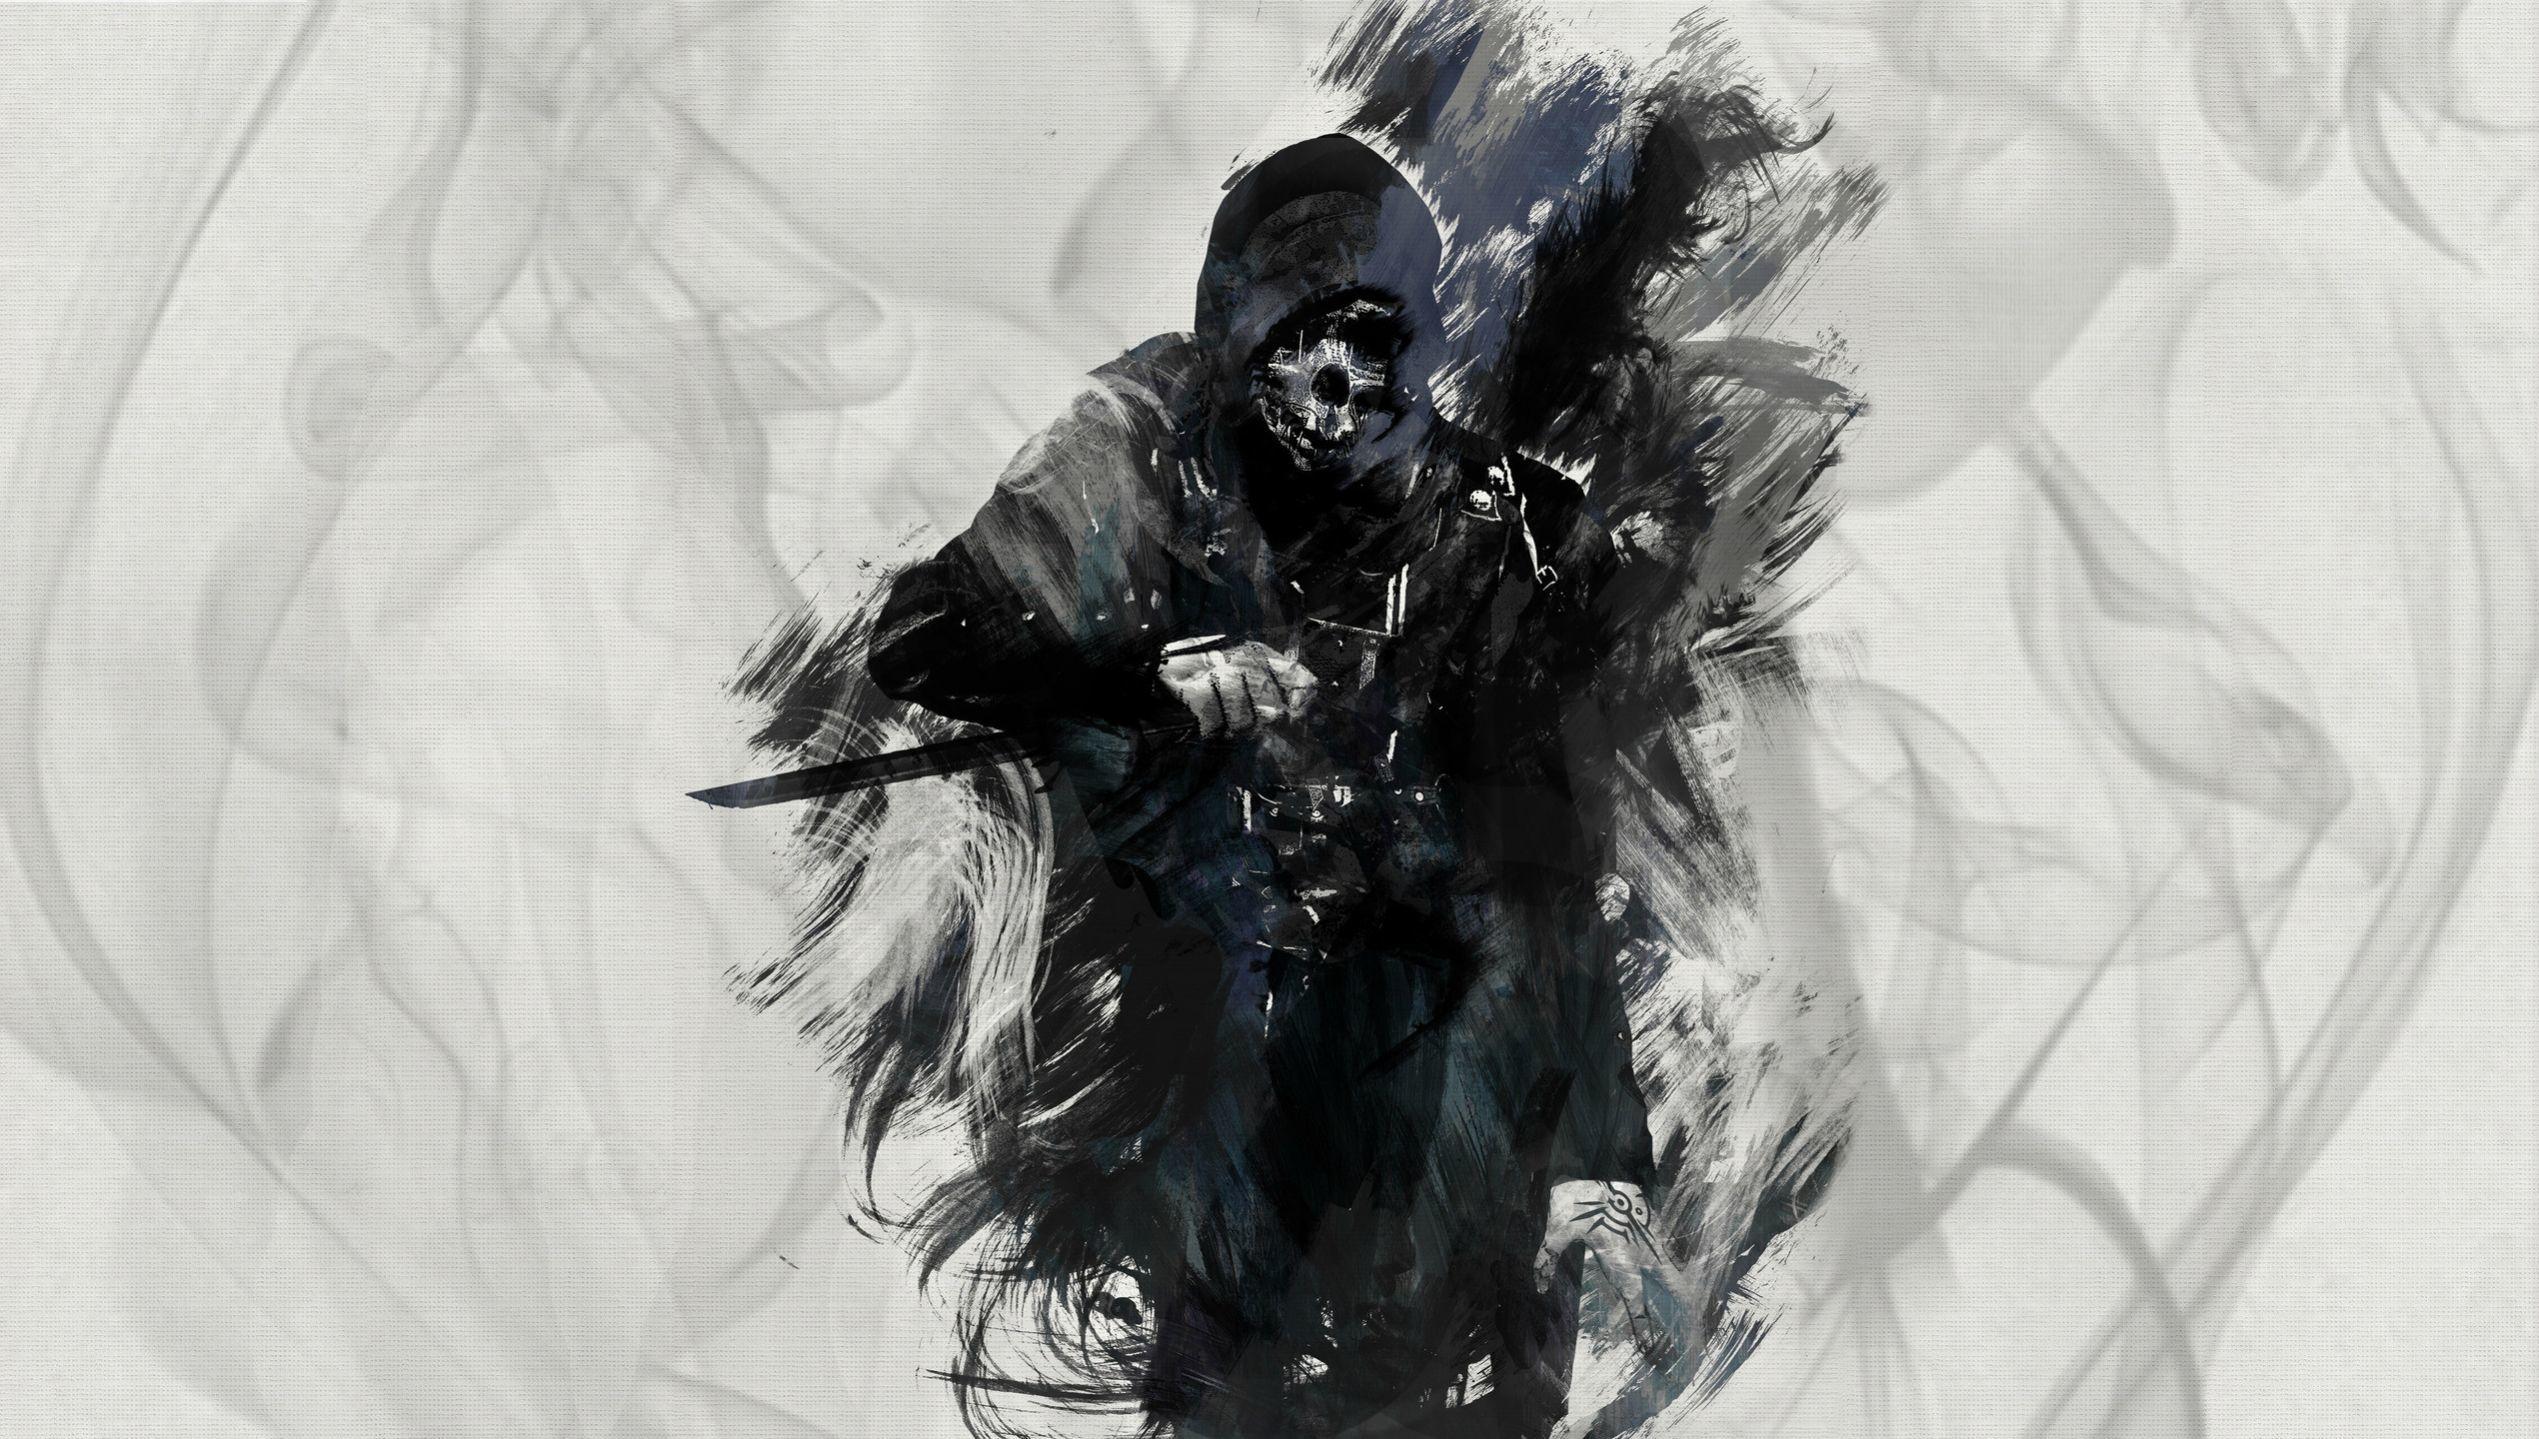 Dishonored, art, corvo attano, убийца обои скачать